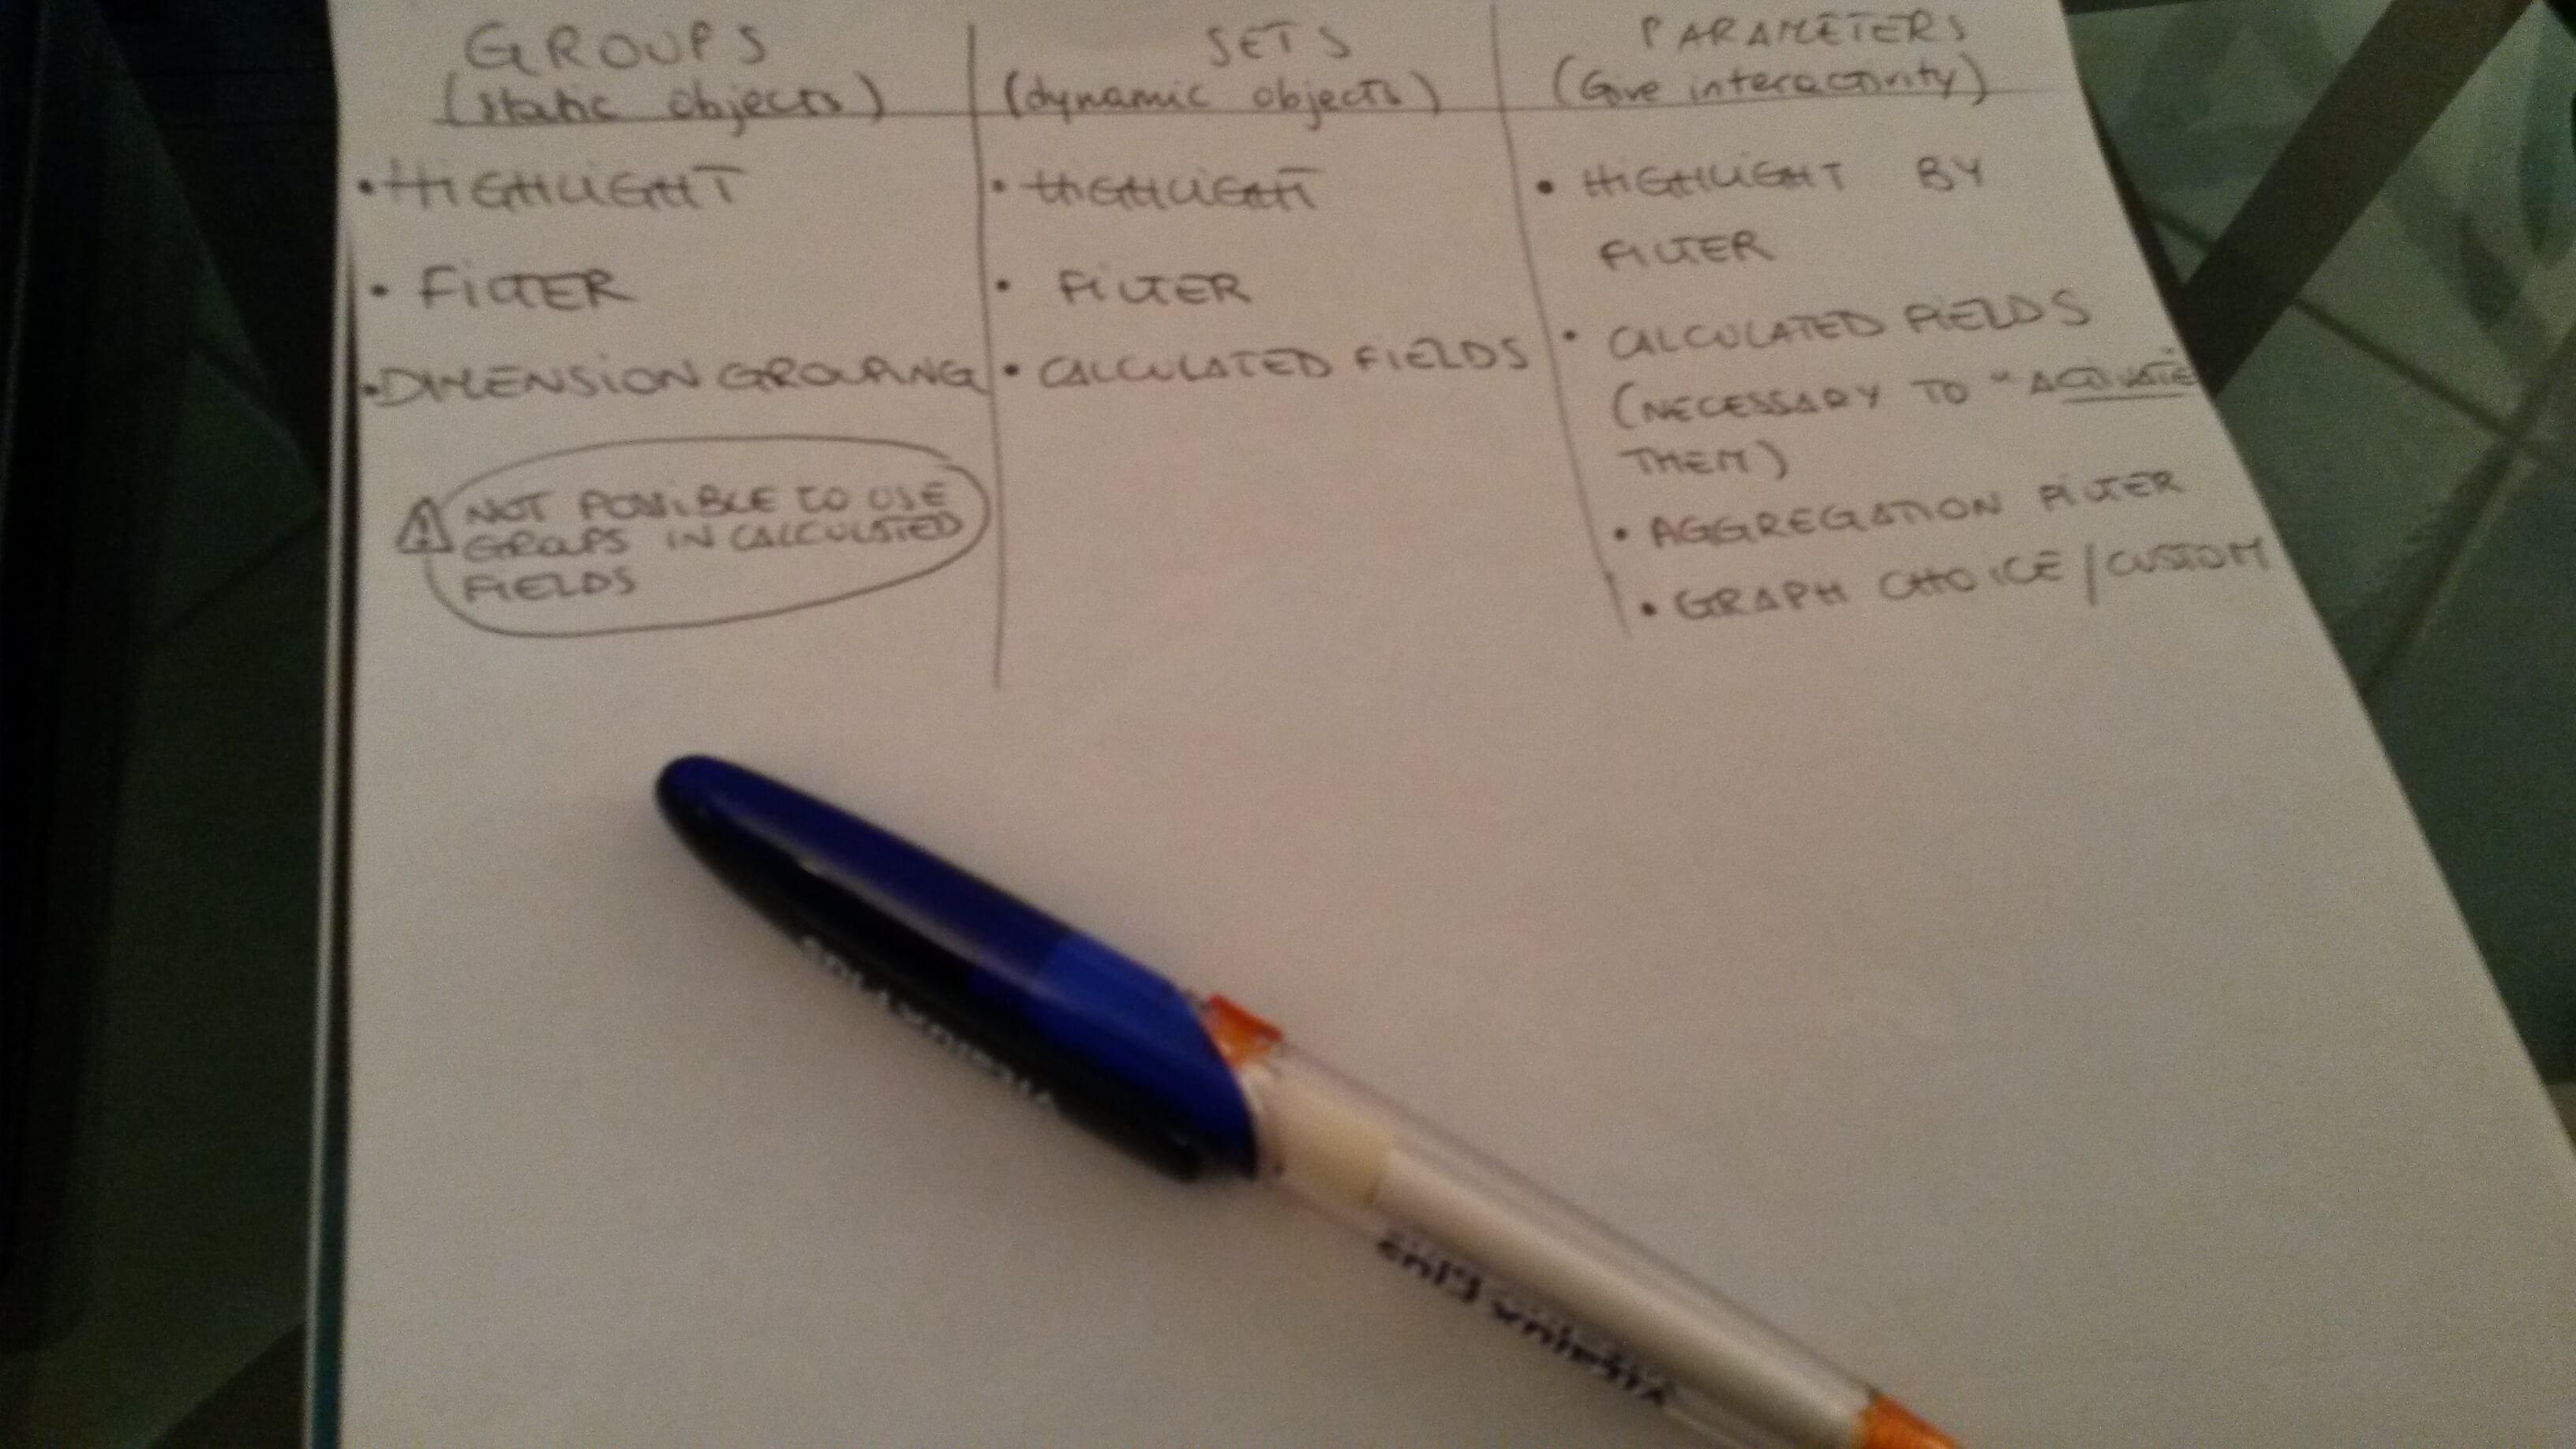 Table group-set-parameter